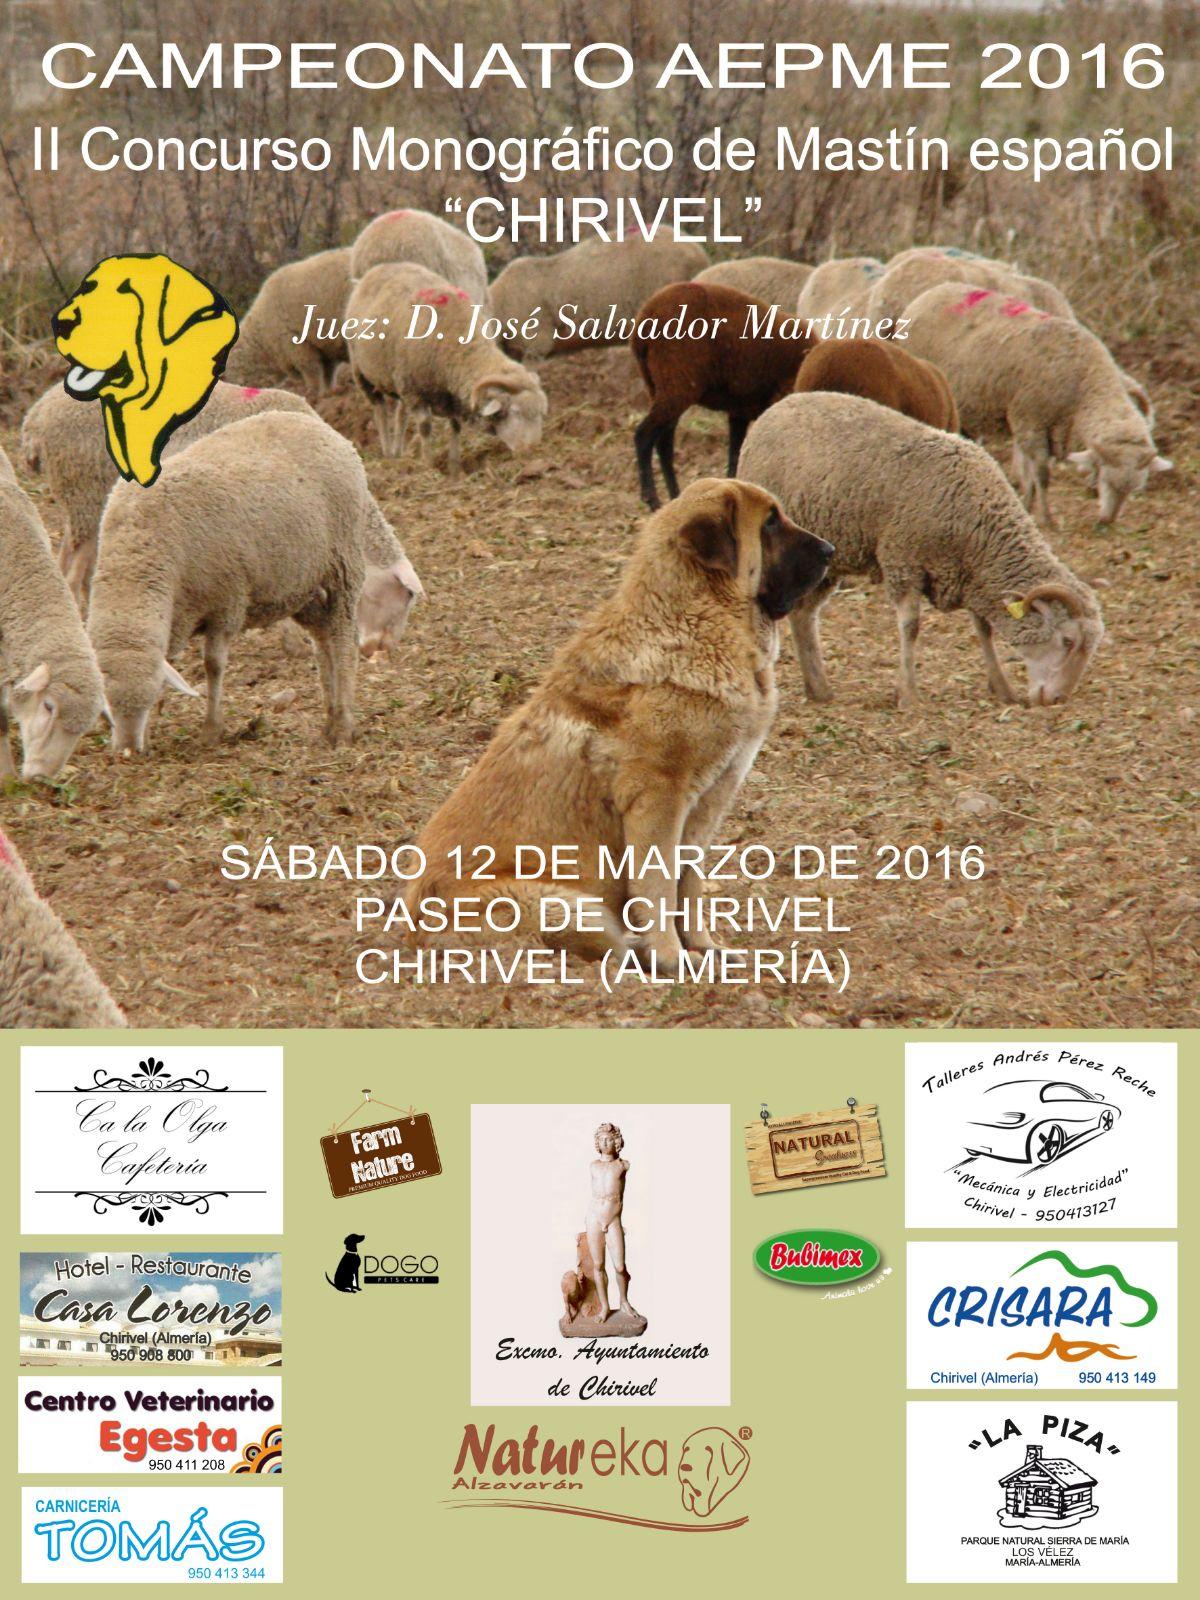 Chirivel 2016 definitivo